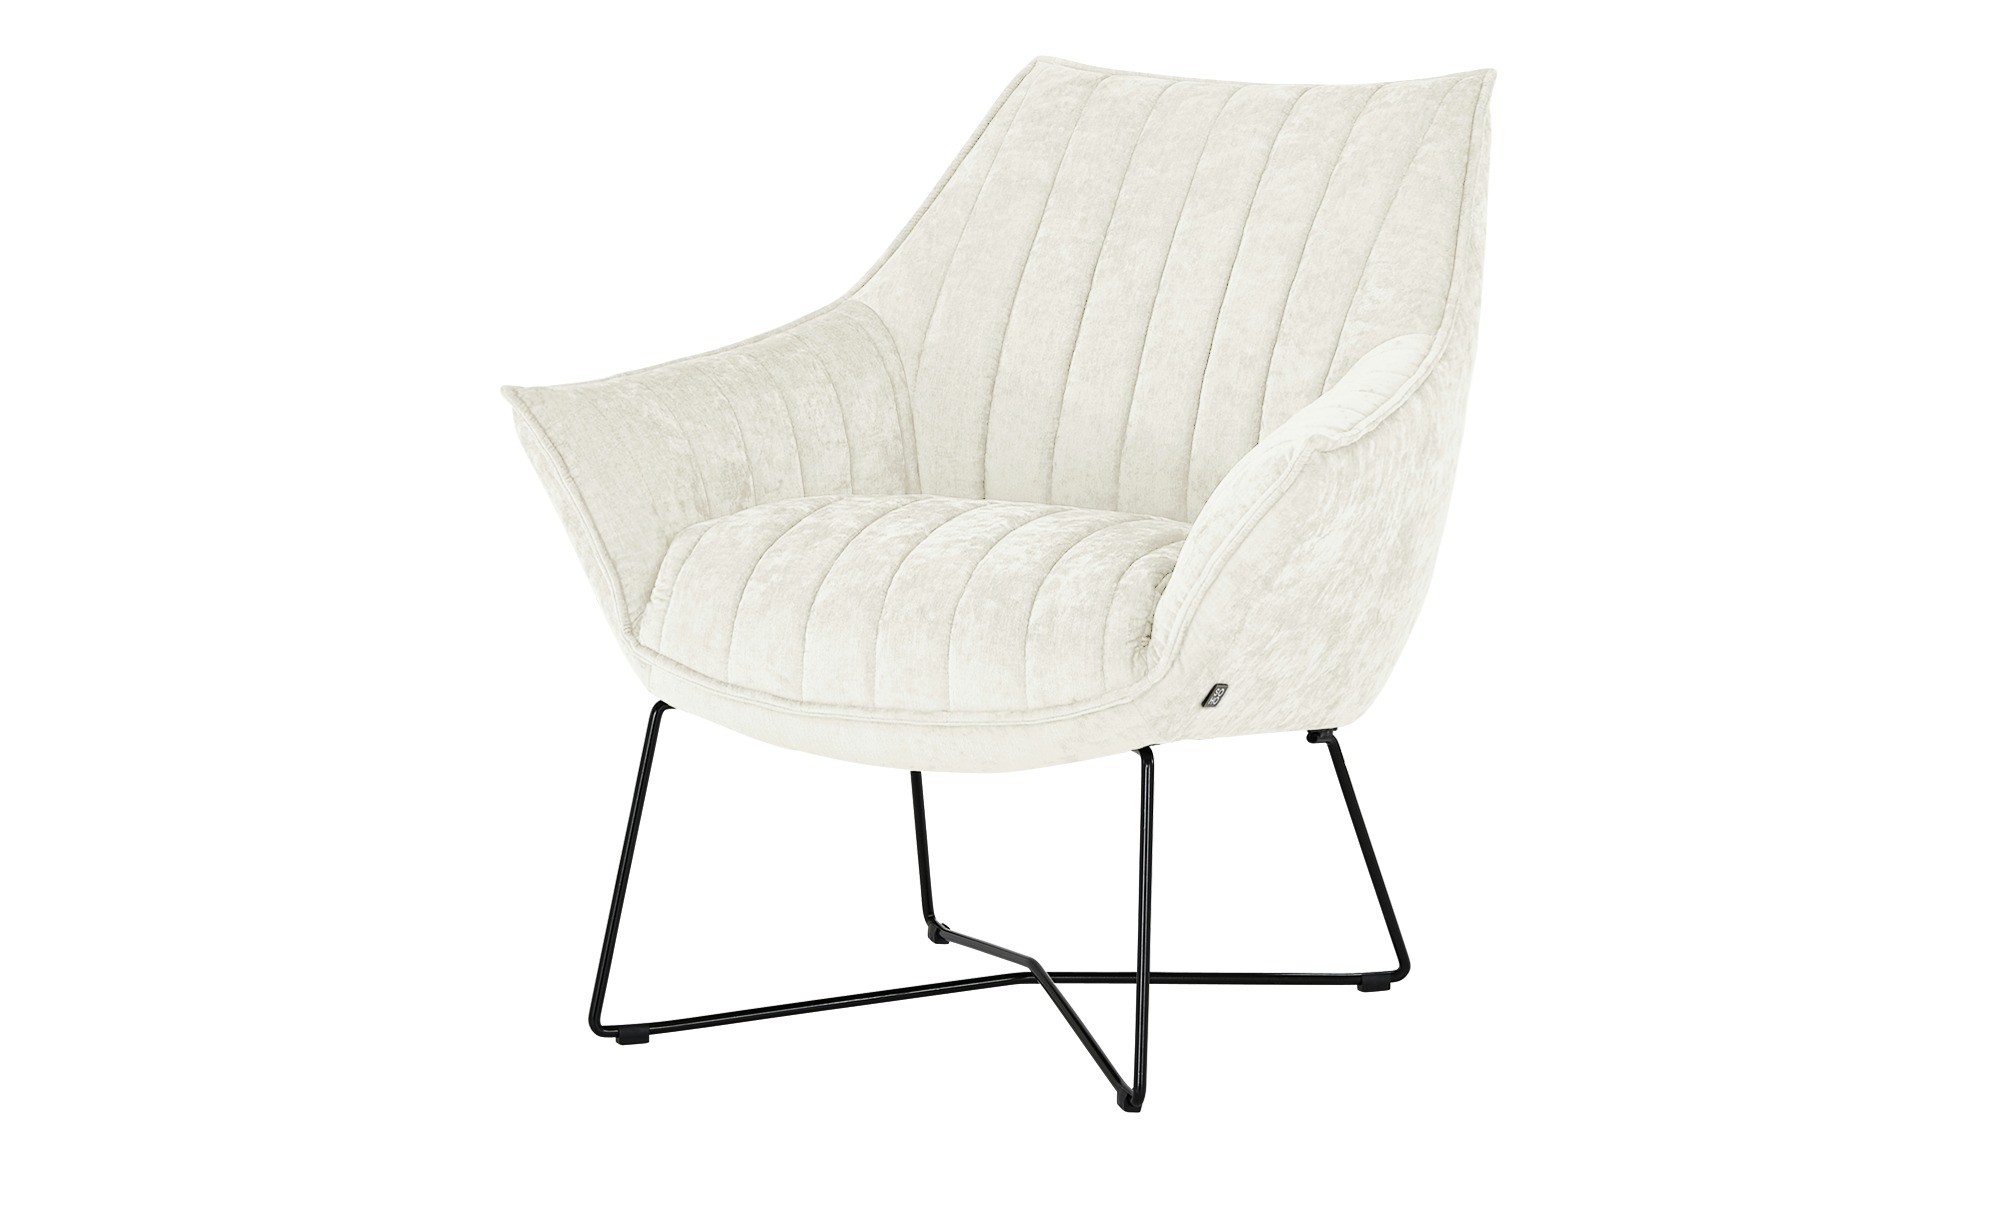 SOHO Sessel  Egeria ¦ creme ¦ Maße (cm): B: 86 H: 80 T: 83 Polstermöbel > Sessel > Polstersessel - Höffner